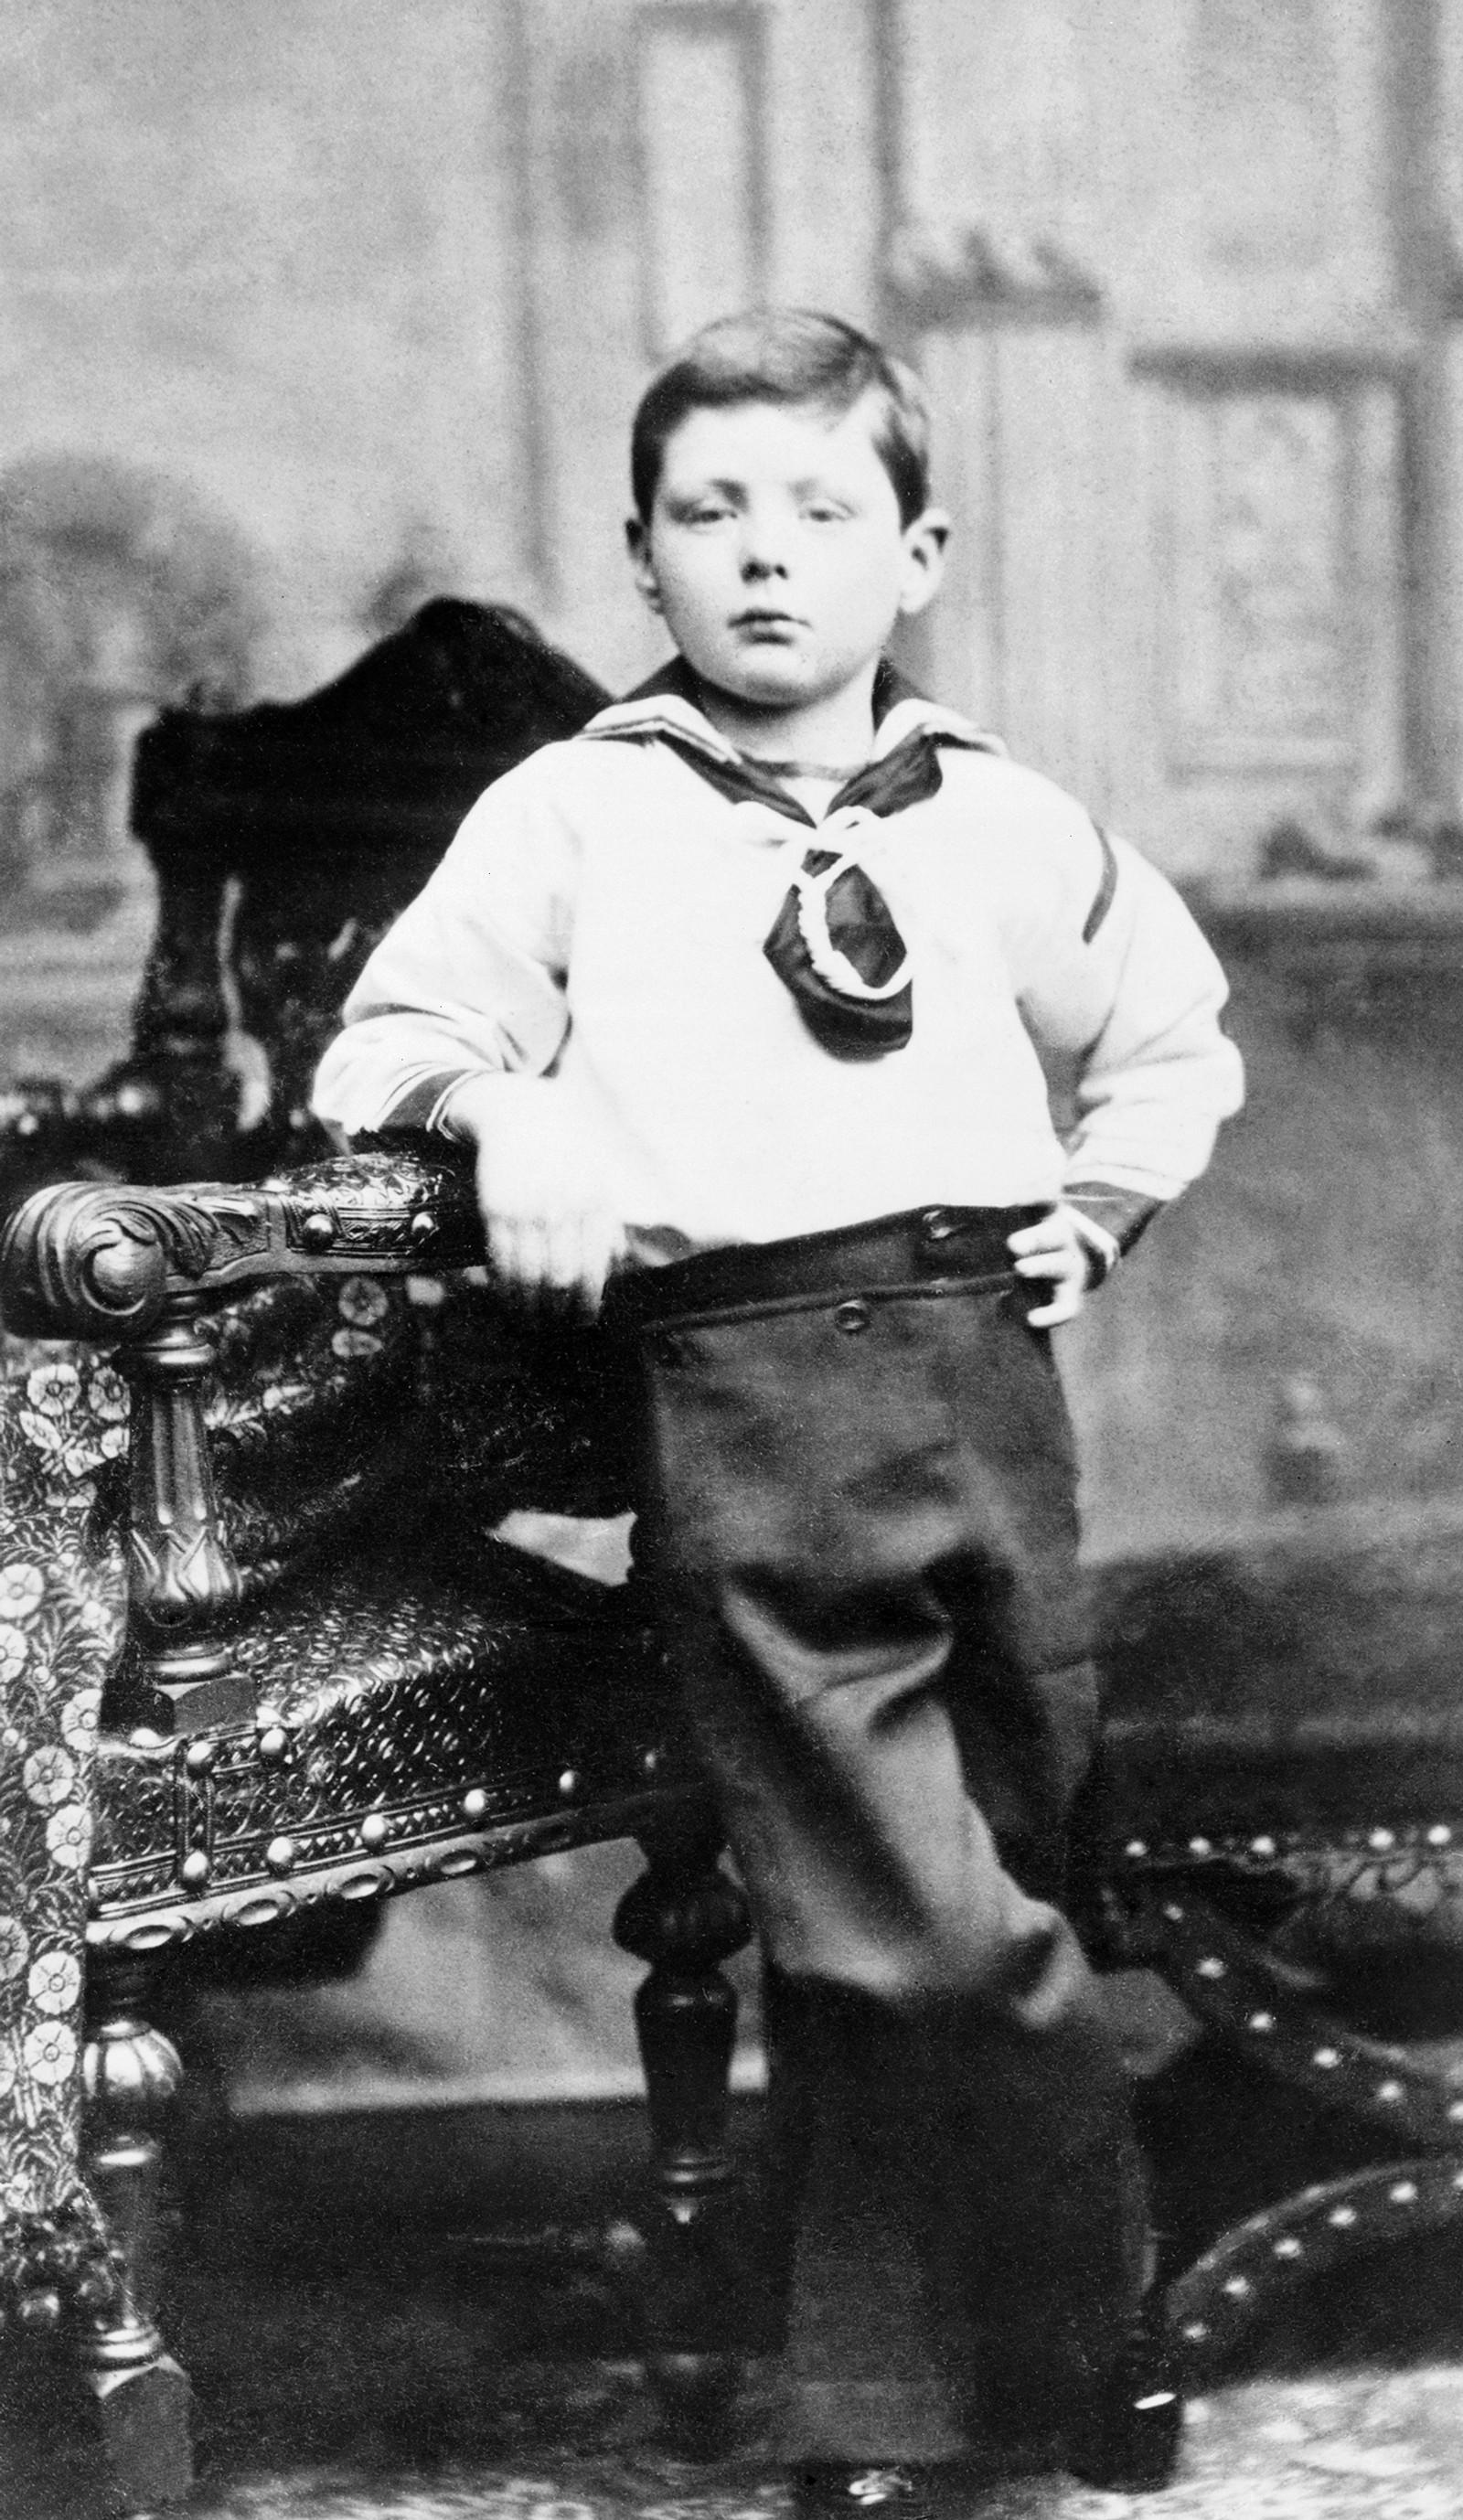 Winston Churchill 7 år gammel, avbildet I Dublin, Irland.